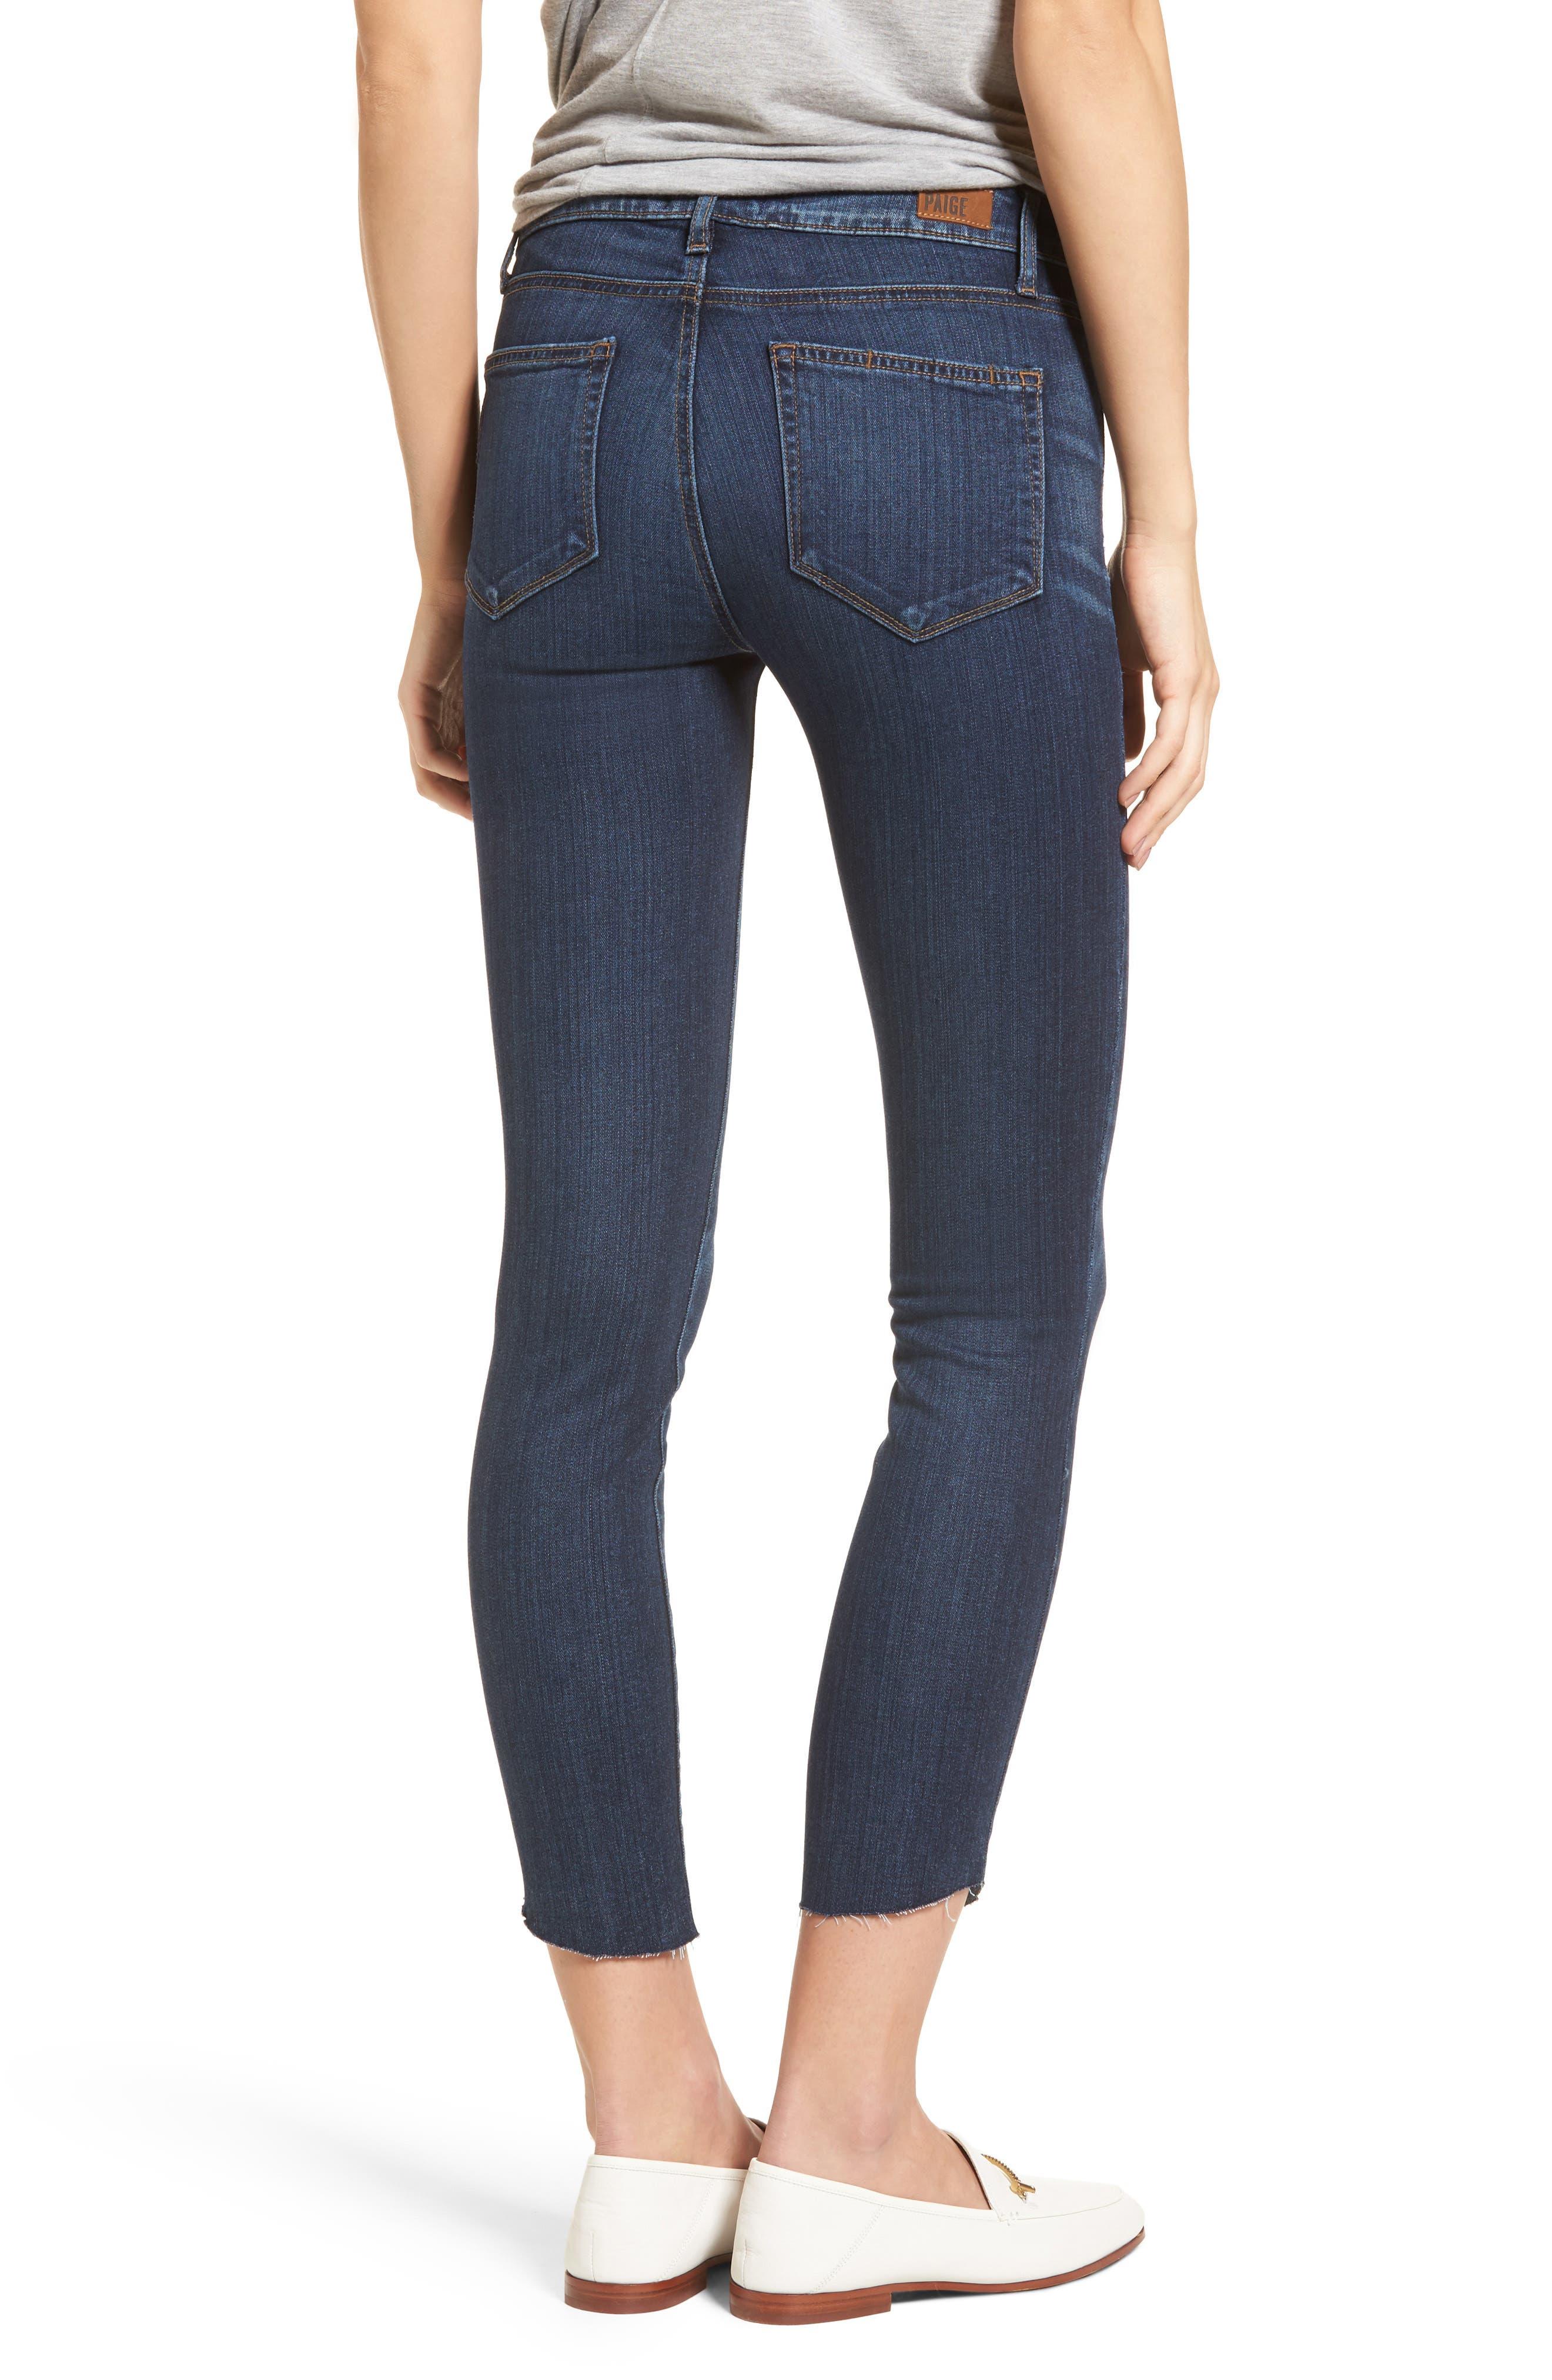 Transcend - Verdugo Ankle Ultra Skinny Jeans,                             Alternate thumbnail 2, color,                             Oaklyn